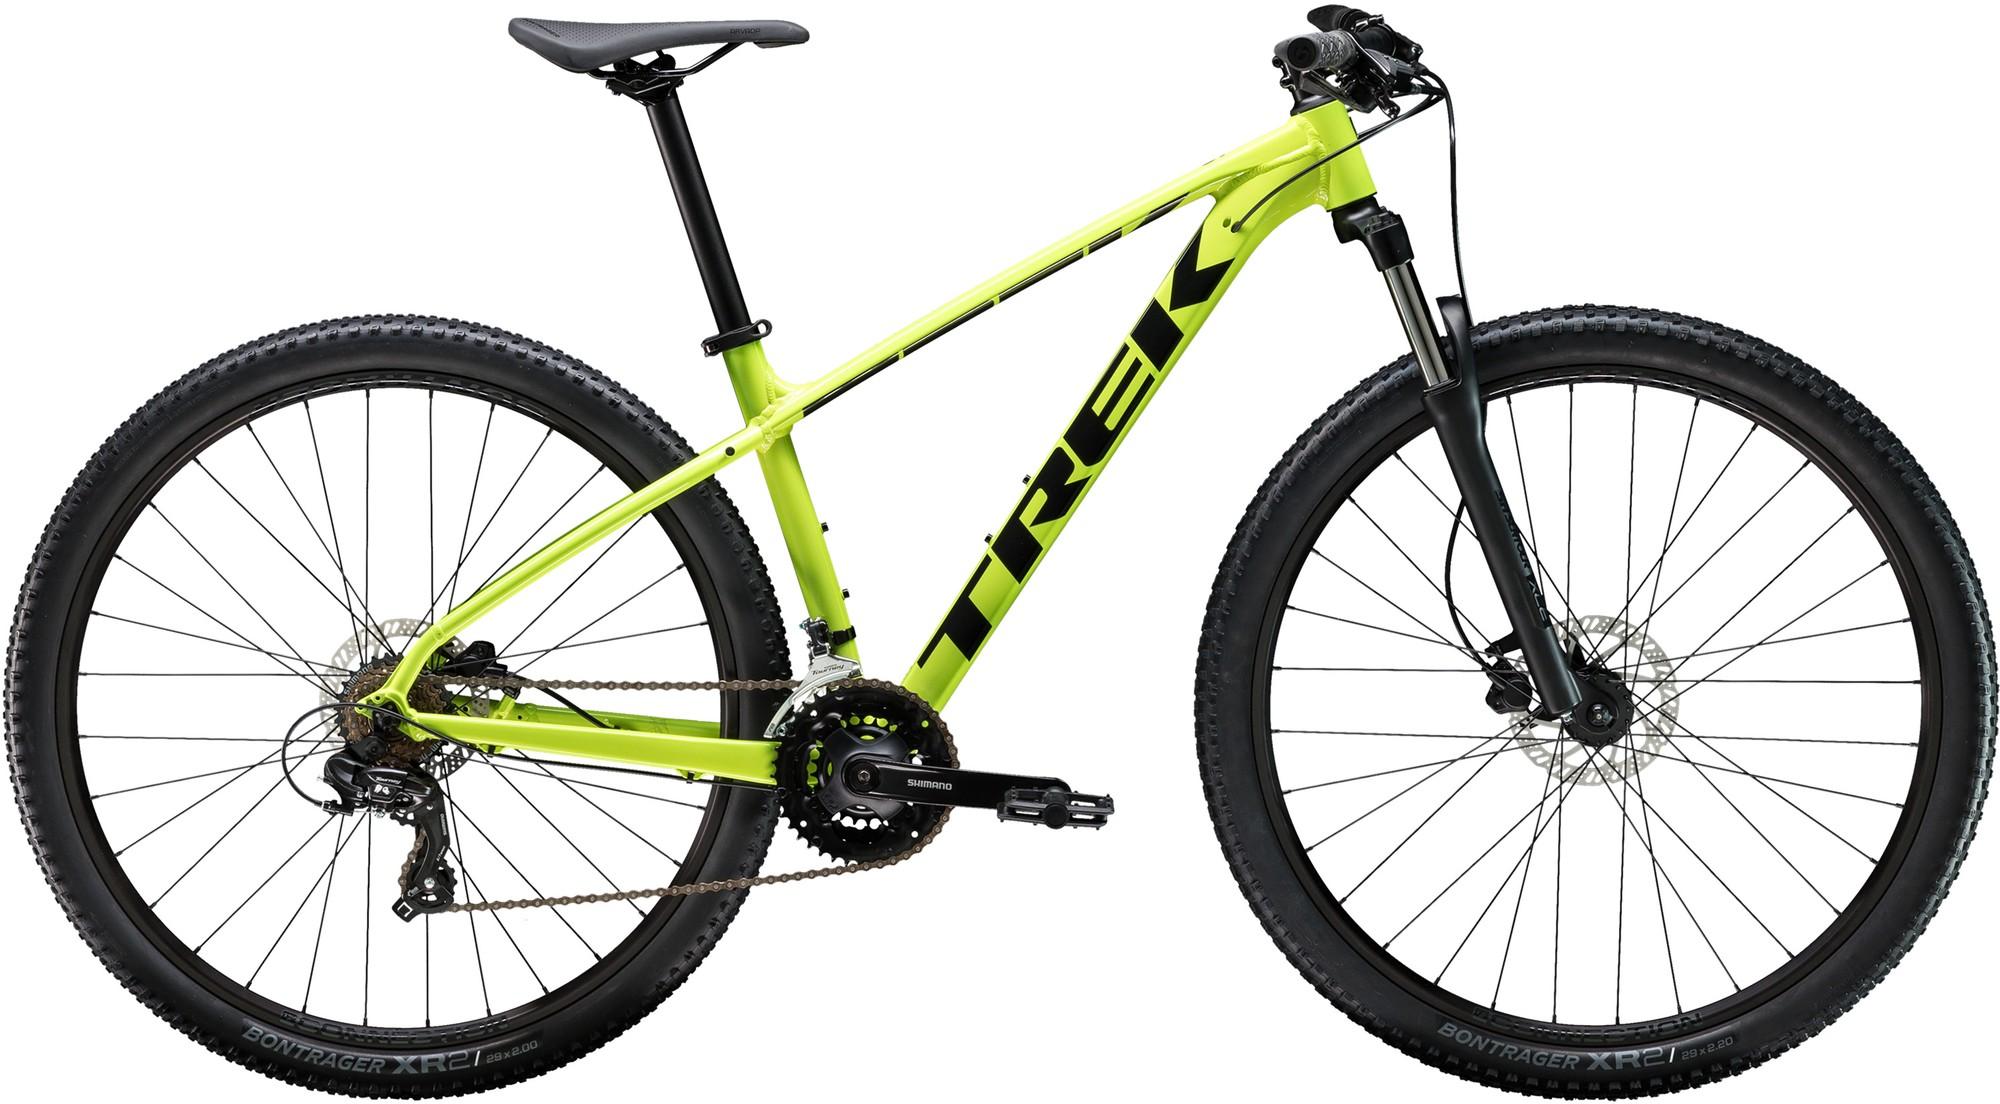 Trek Велосипед горный Trek Marlin 5 29 велосипед trek superfly 5 27 5 2016